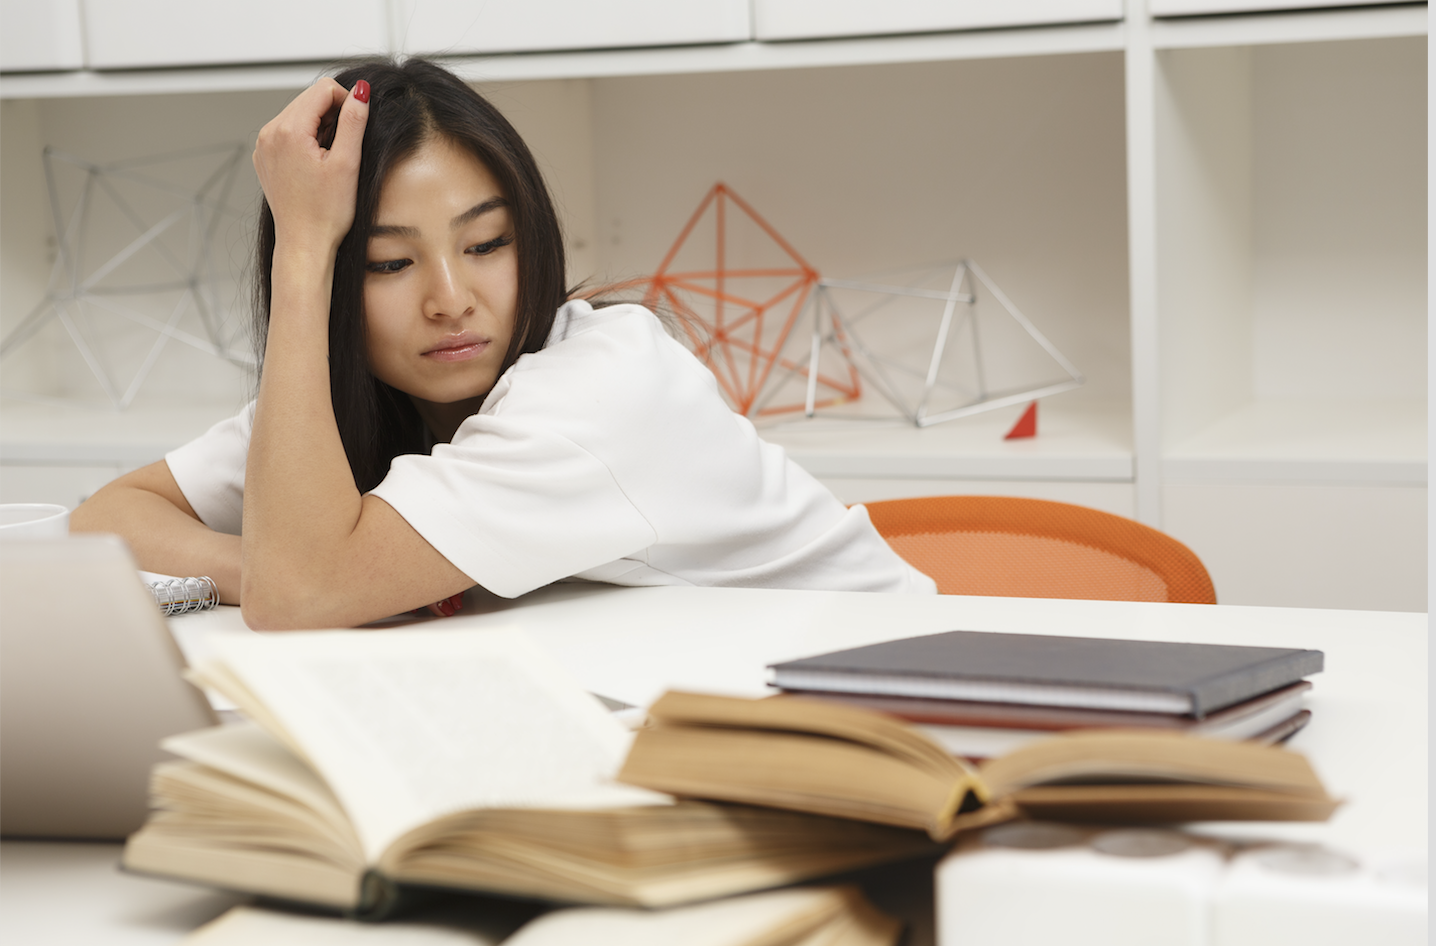 Teenager studying screen shot